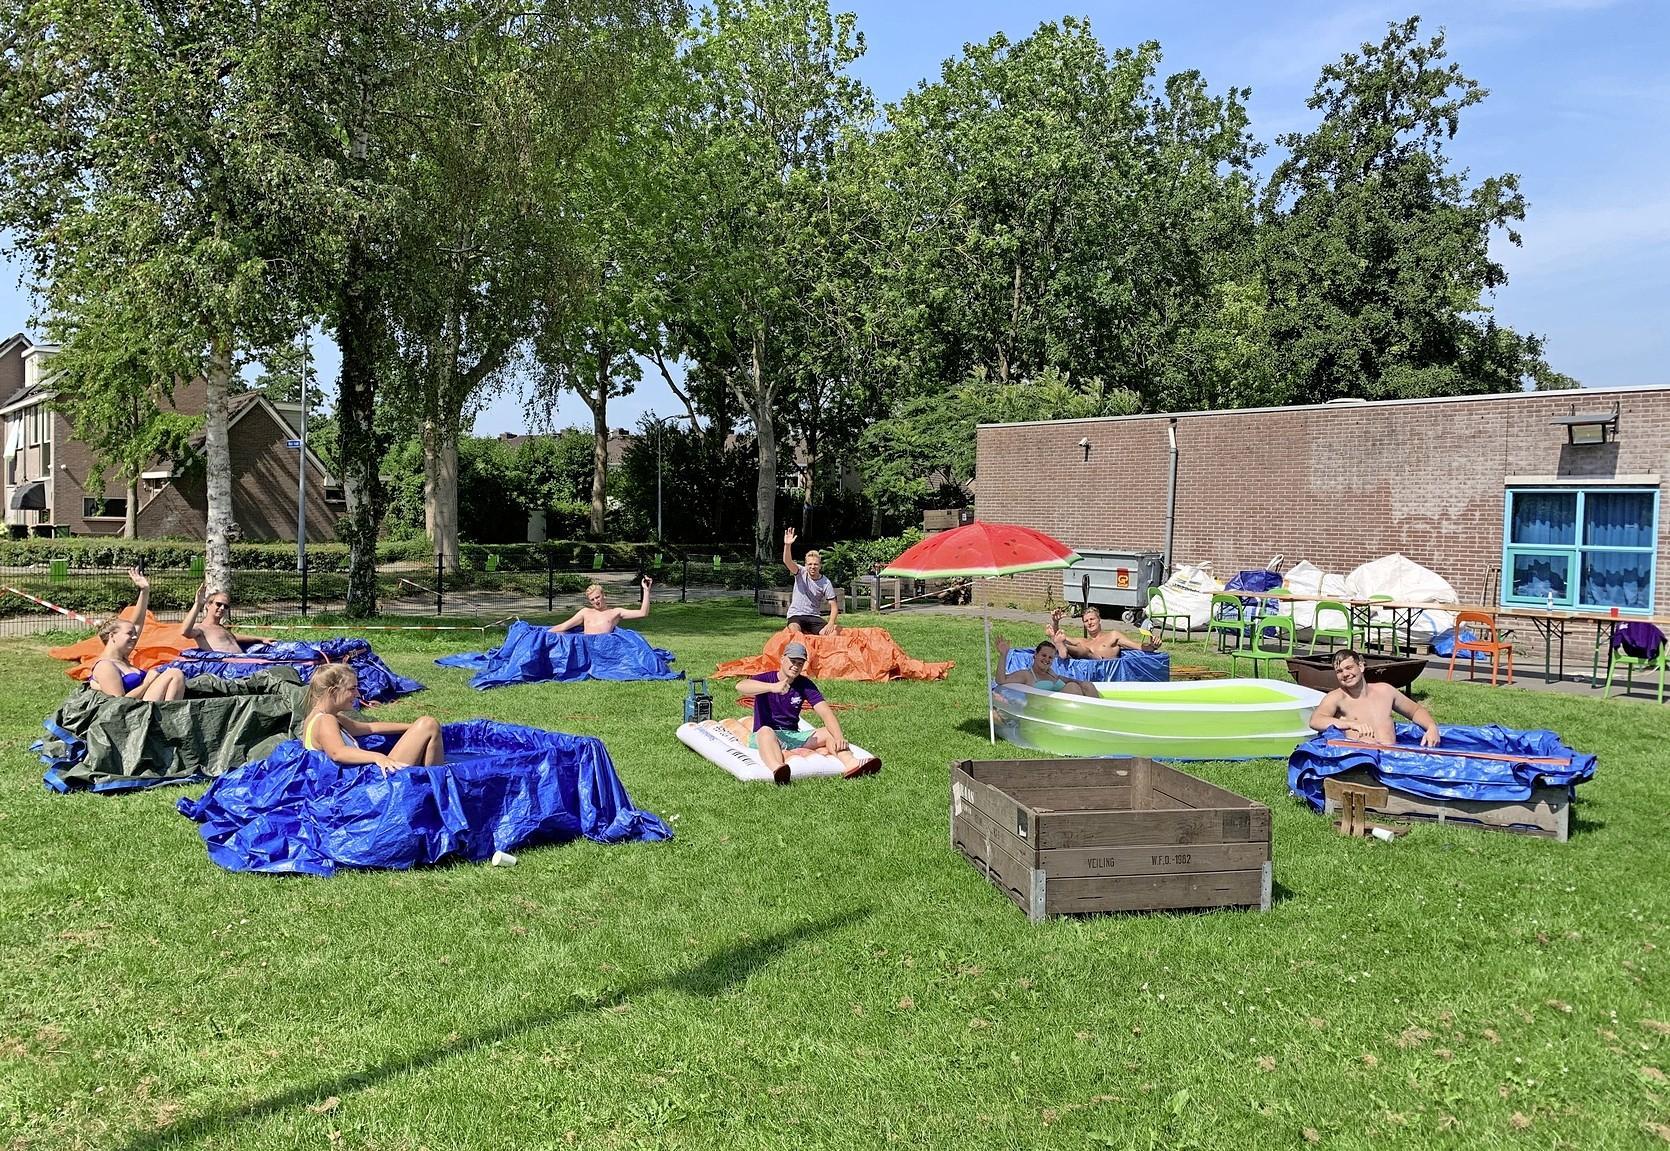 Crowdfunding gestart tijdens quarantaine, na afblazen zomerkamp jeugd in Wognum vanwege corona